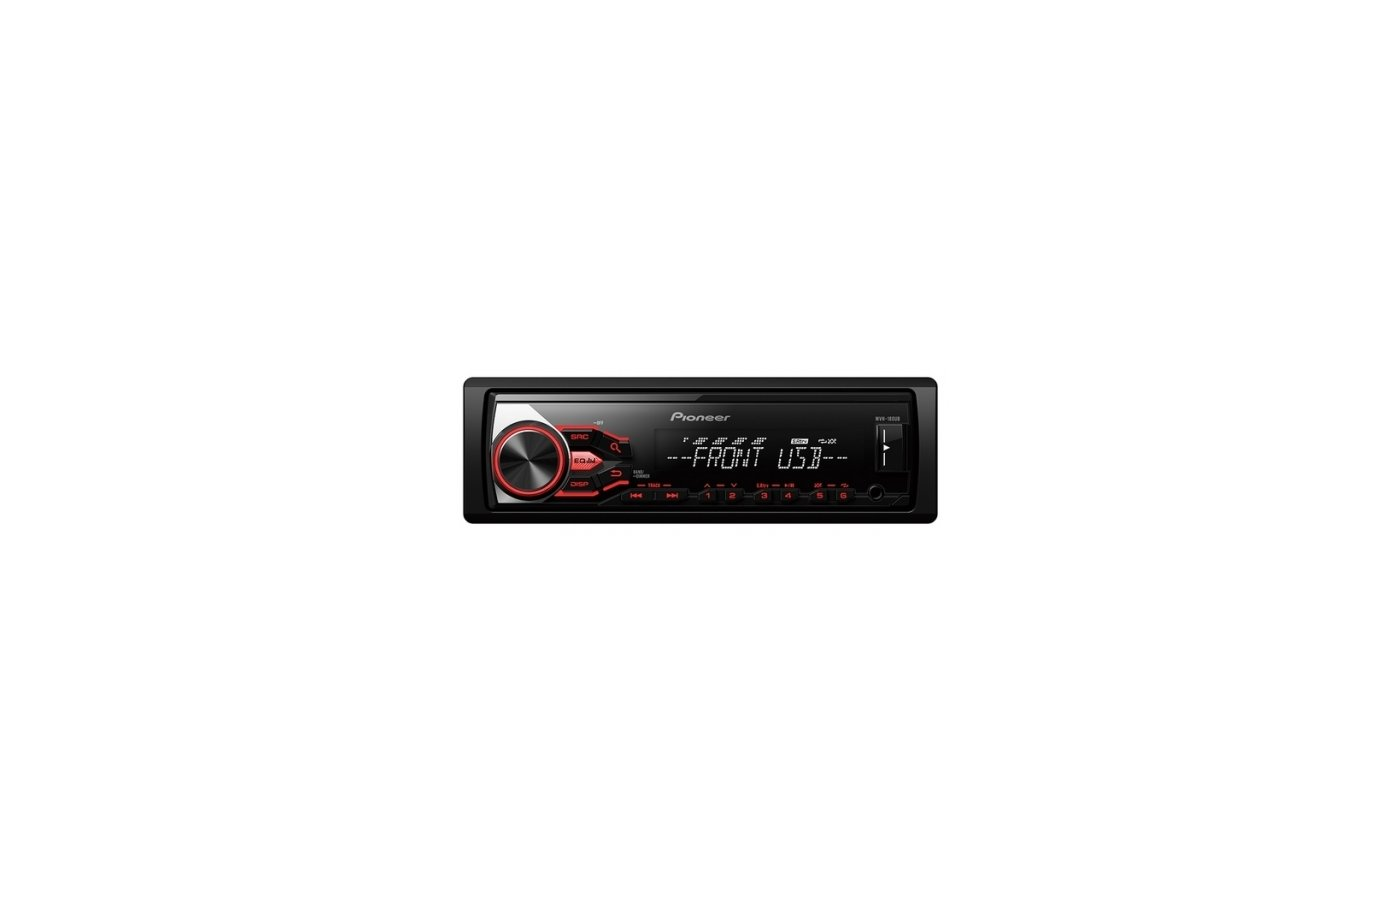 Автомагнитола PIONEER MVH-180UB + PIONEER 12-C-USB-8GB